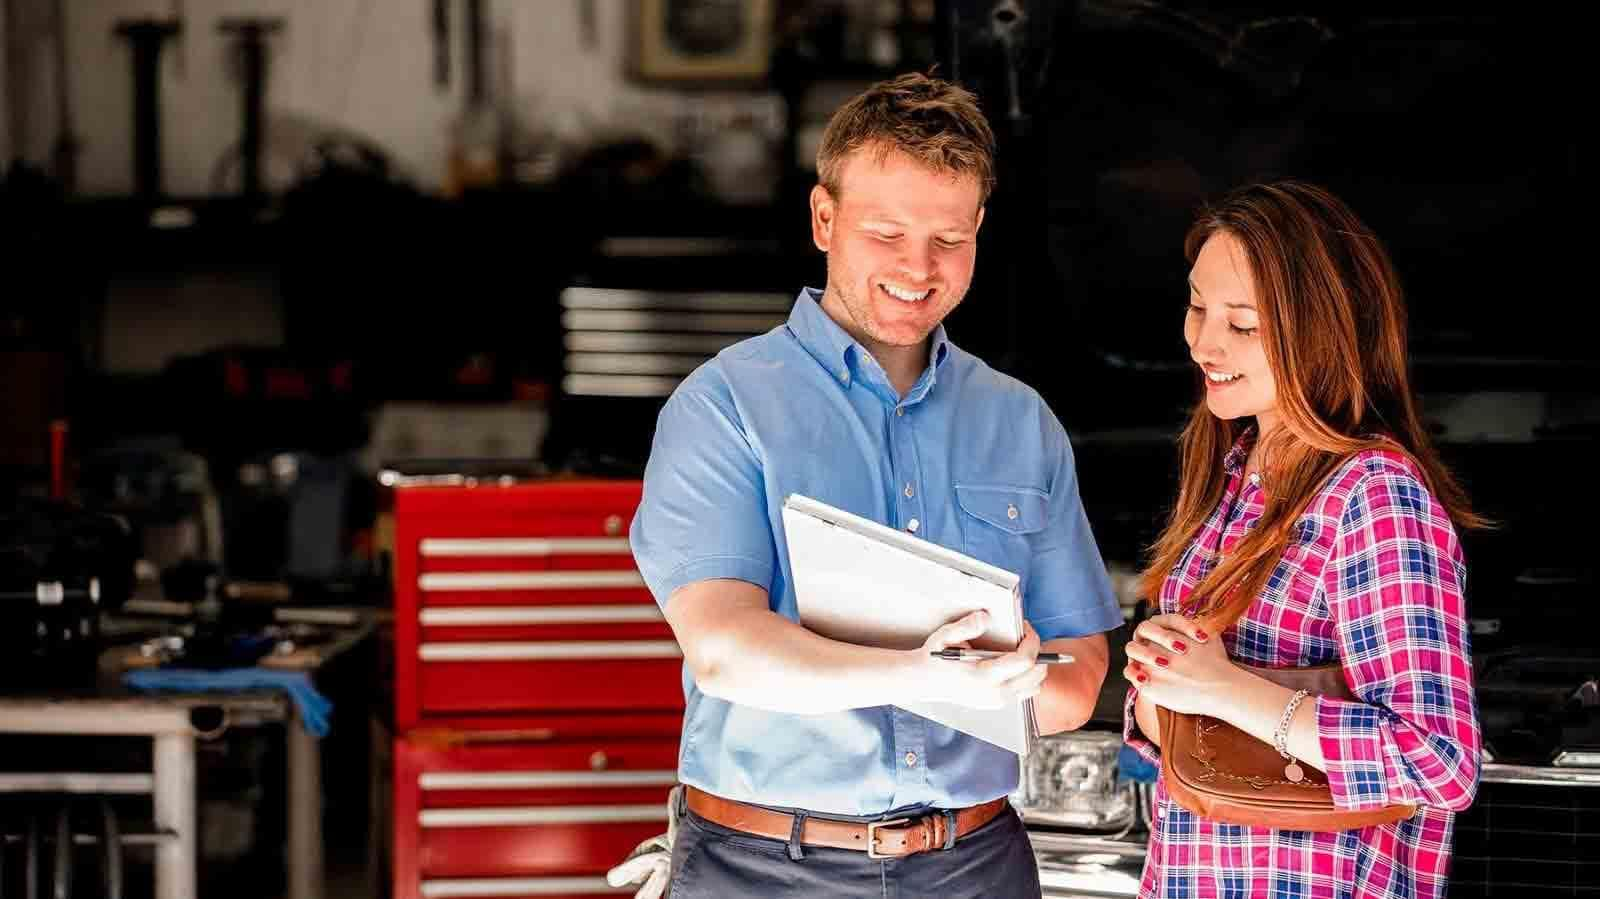 Mechanic showing client inspection